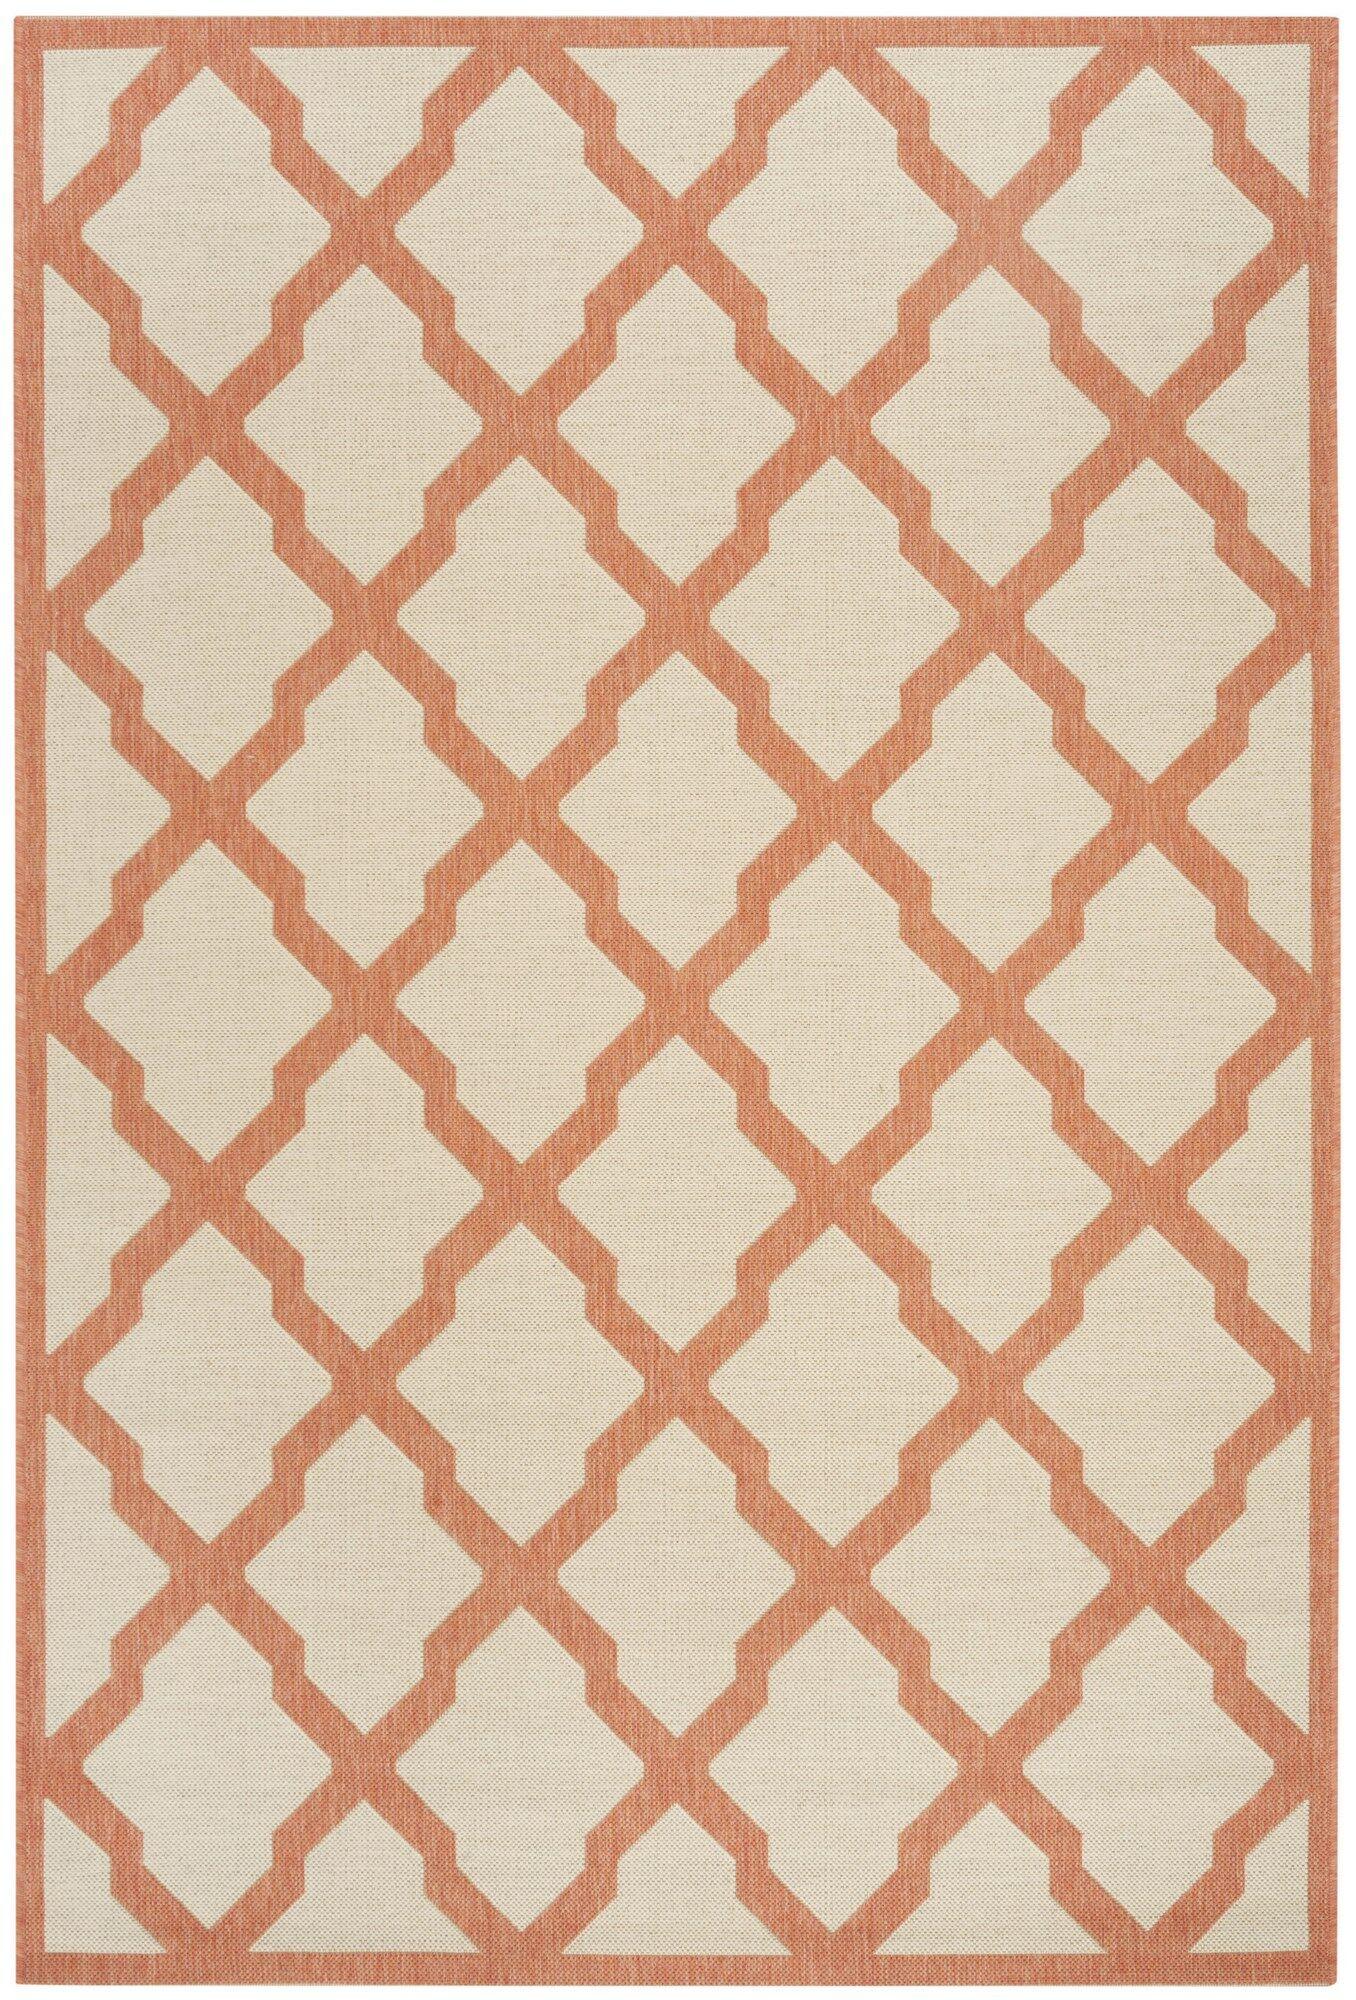 Cashion Cream/Rust Area Rug Rug Size: Rectangle 8' x 10'